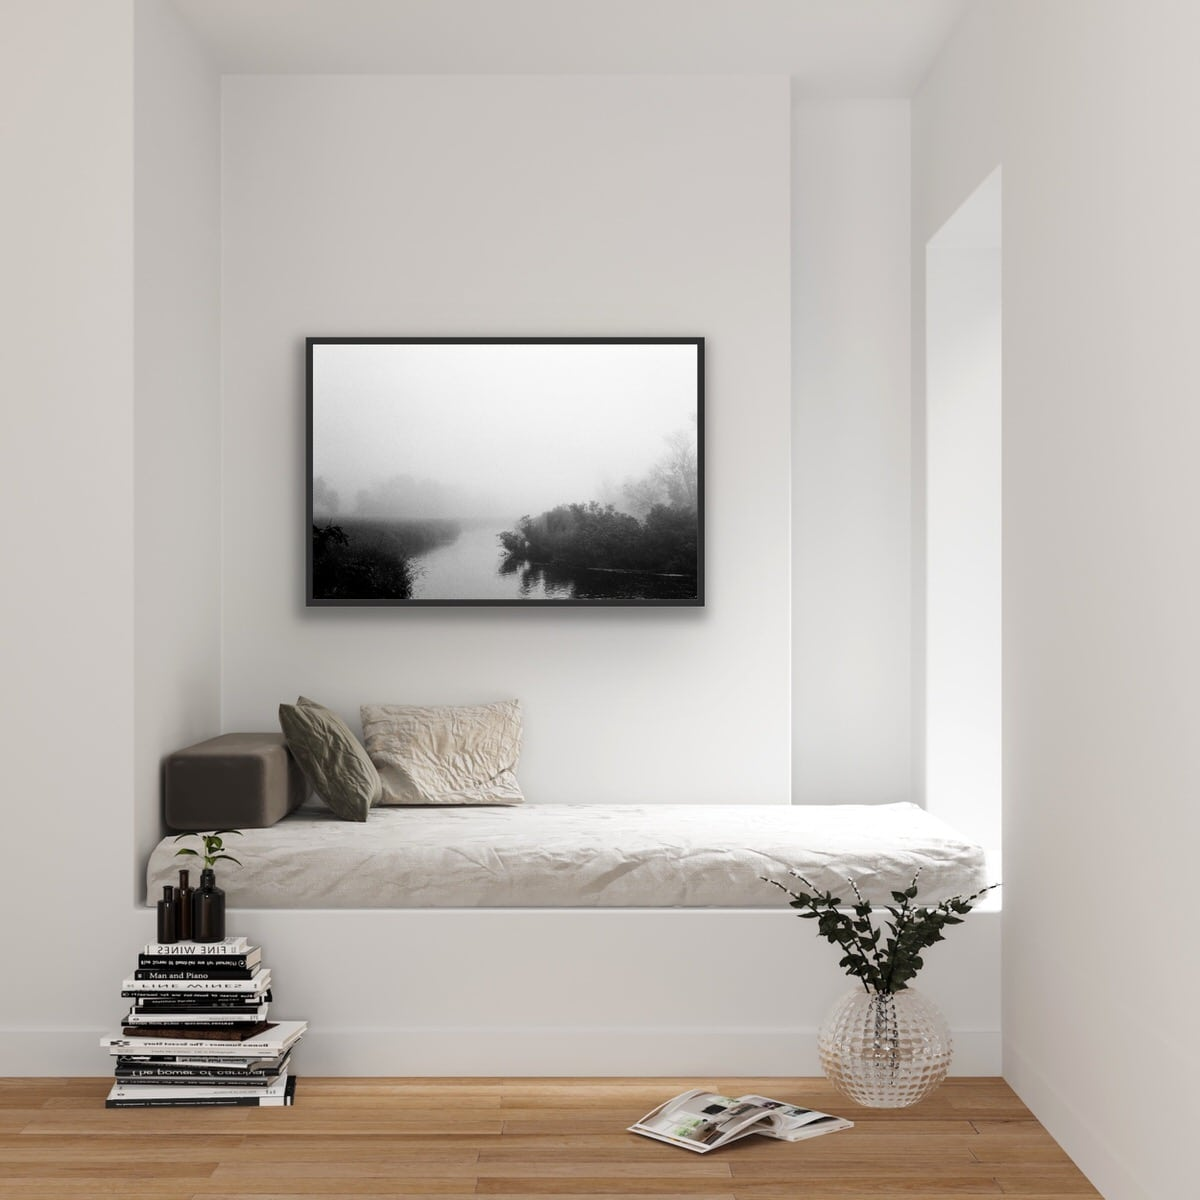 Black-and-white-fine-art-film-photography-wall-decor-by-emerging-artist-Studio-L-photographer-Laura-Schneider-_4712